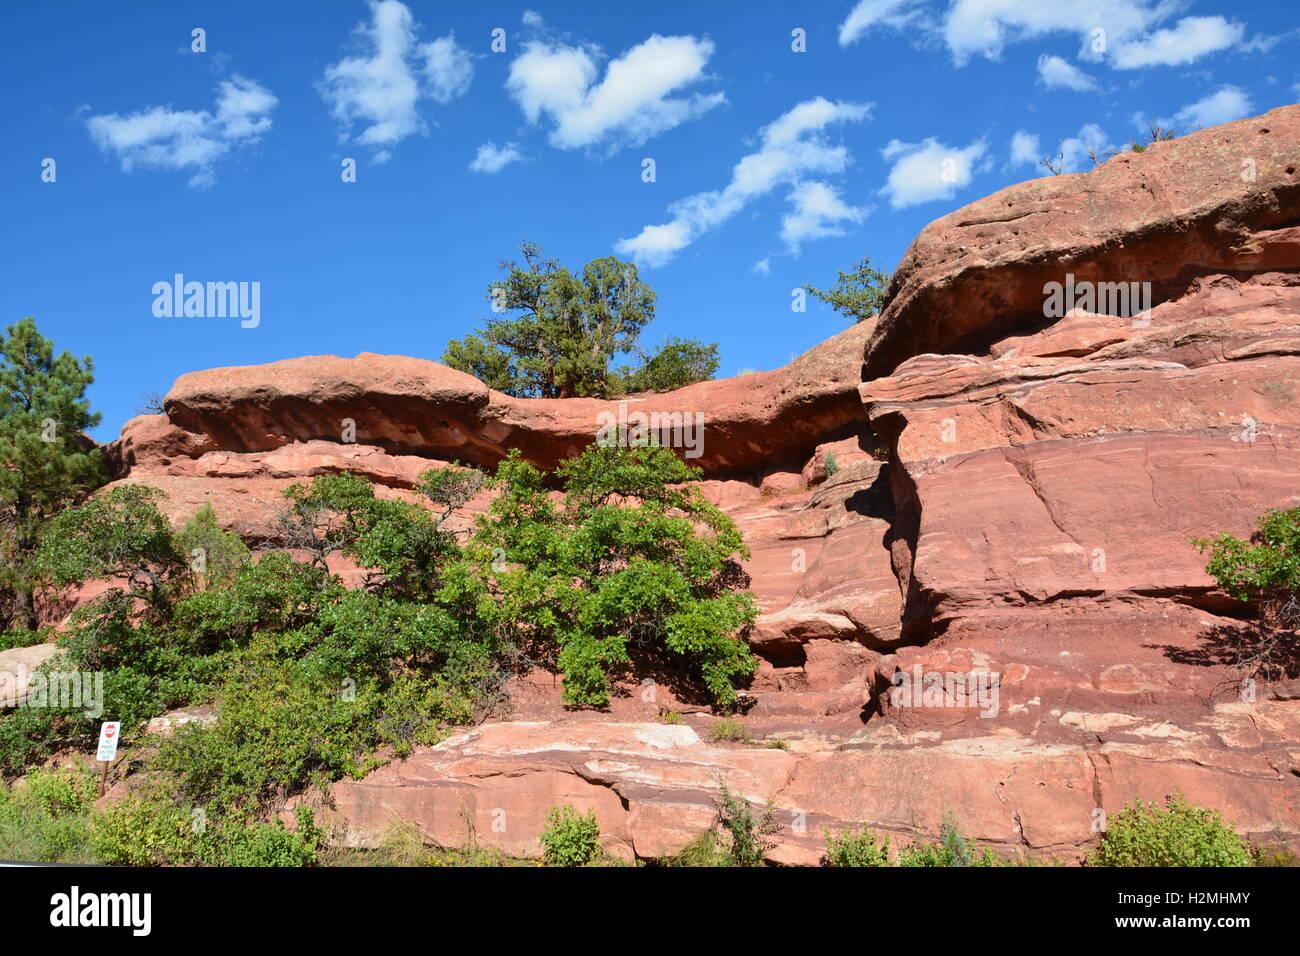 Sandstone rock formation at Garden of the Gods Park in Colorado Springs - Stock Image